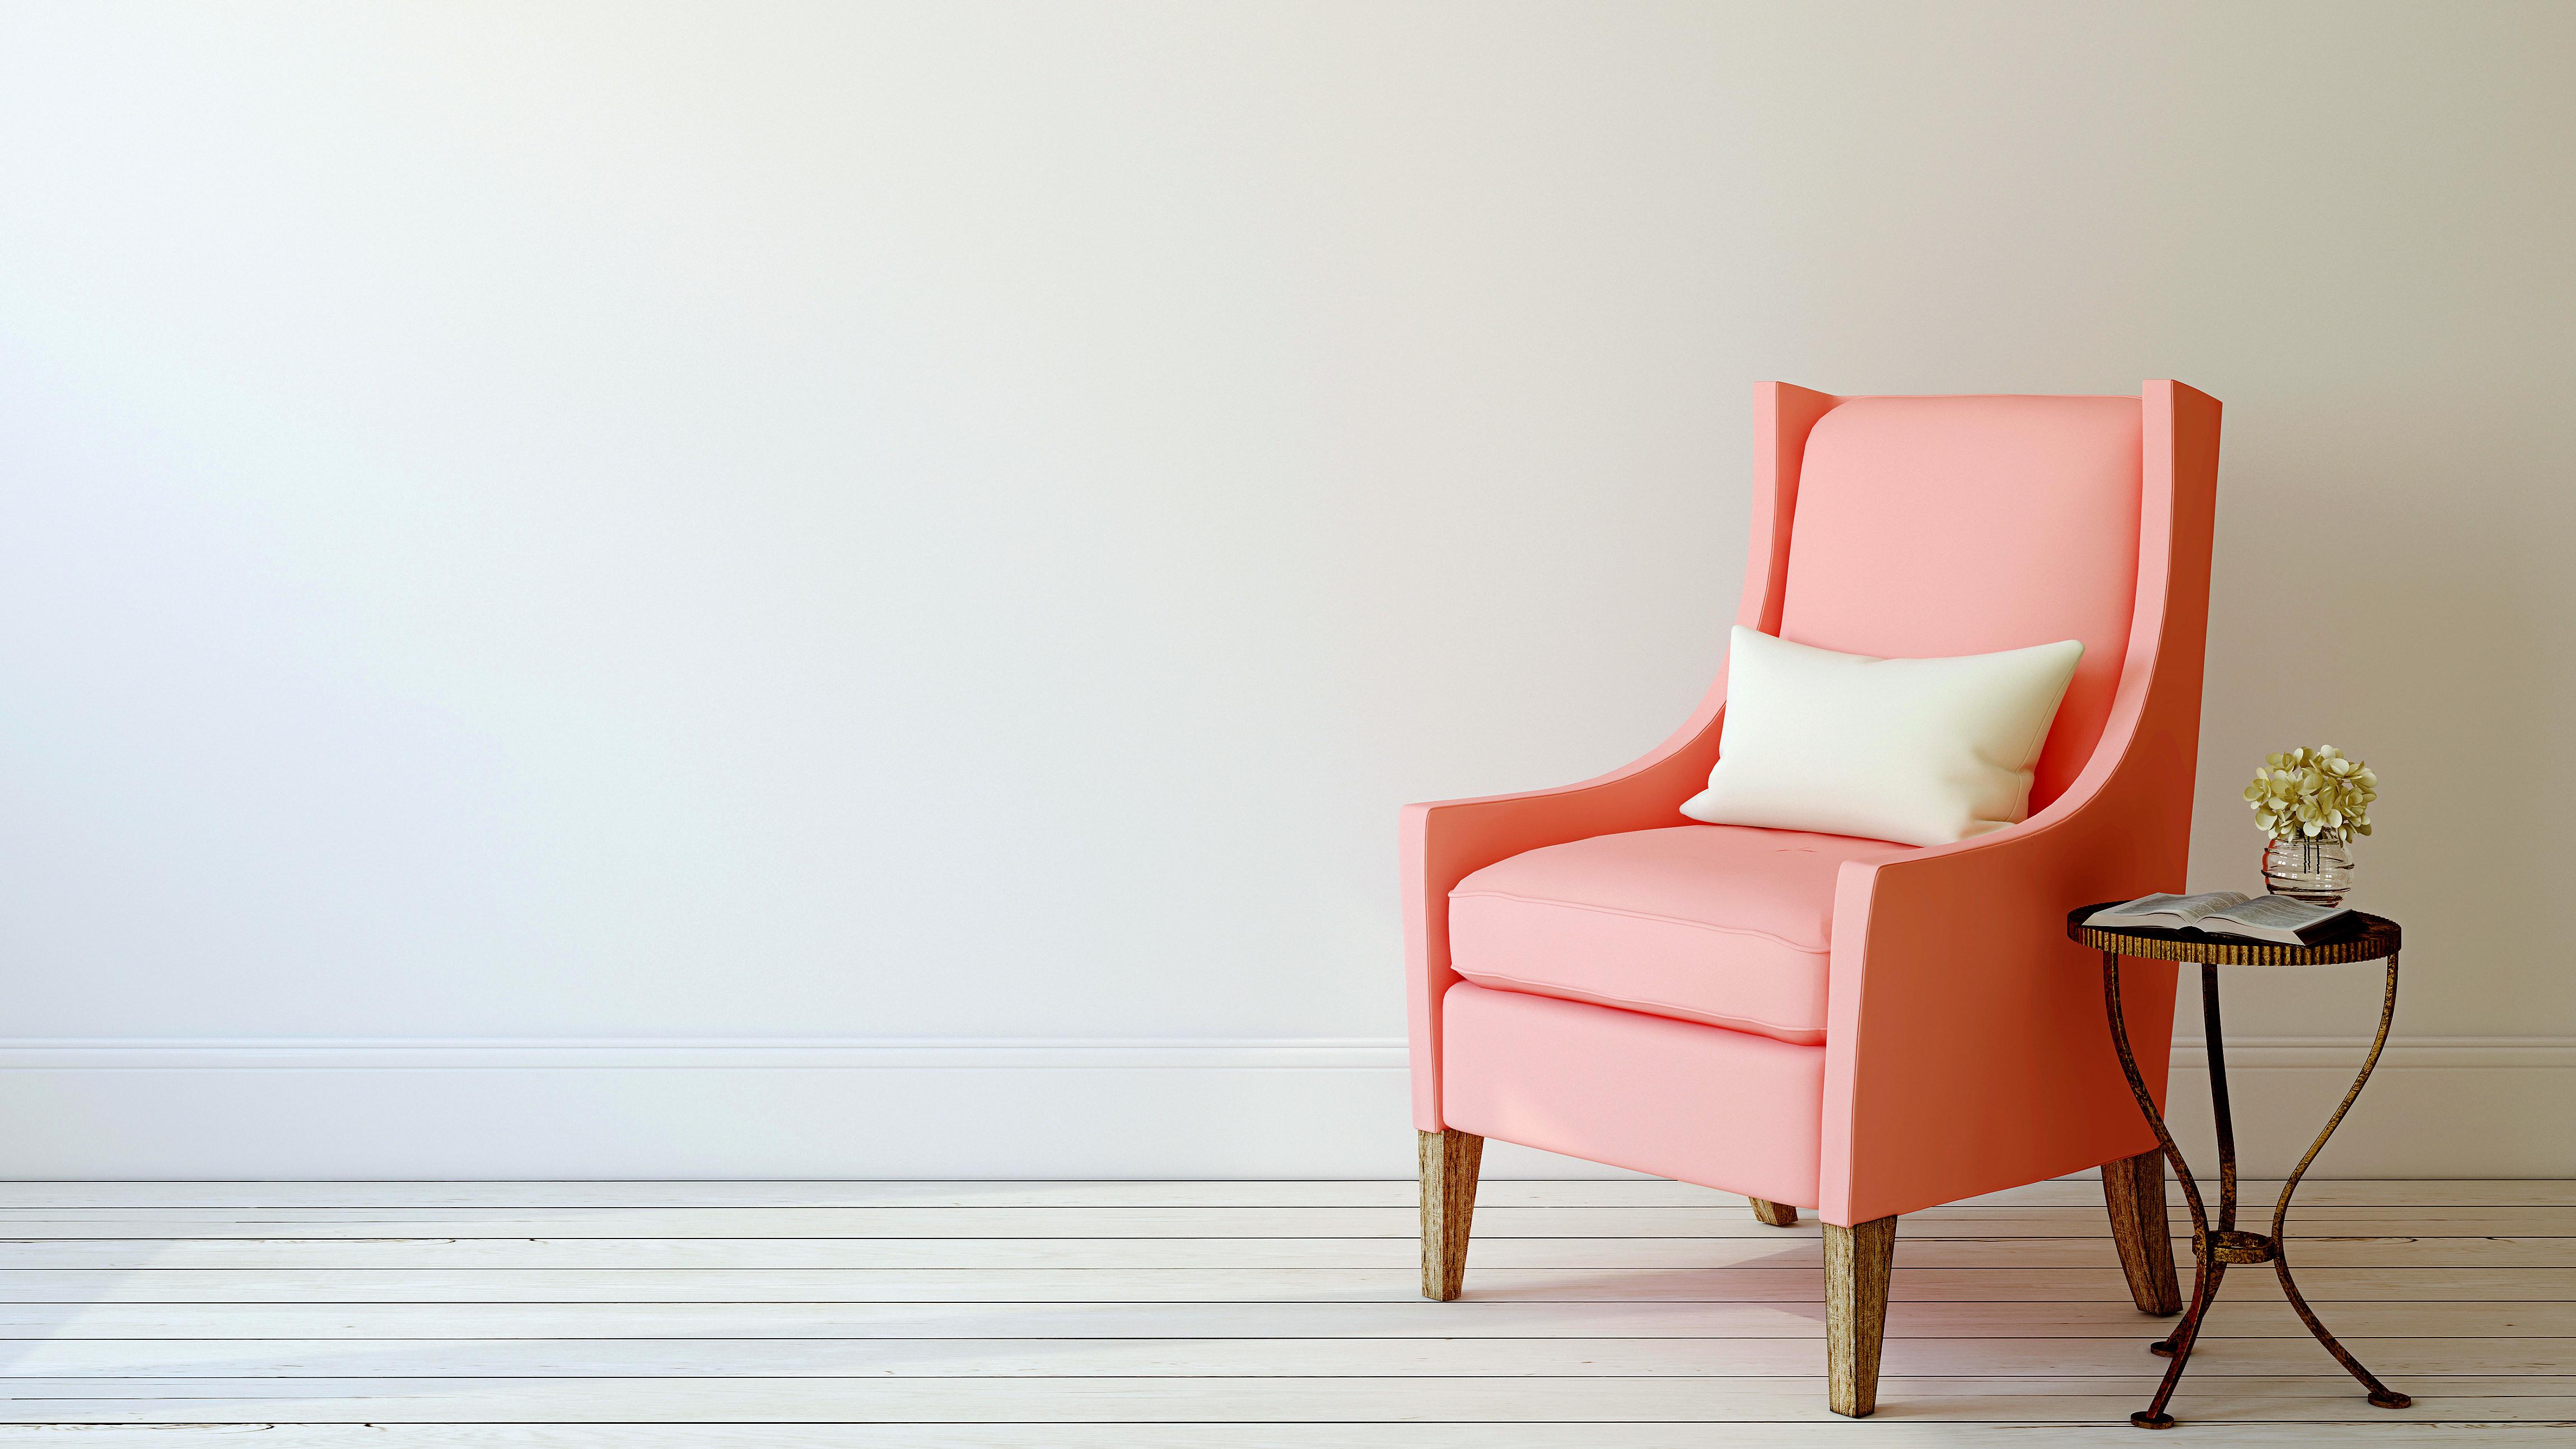 Furniture 4k Ultra Hd Wallpaper Background Image